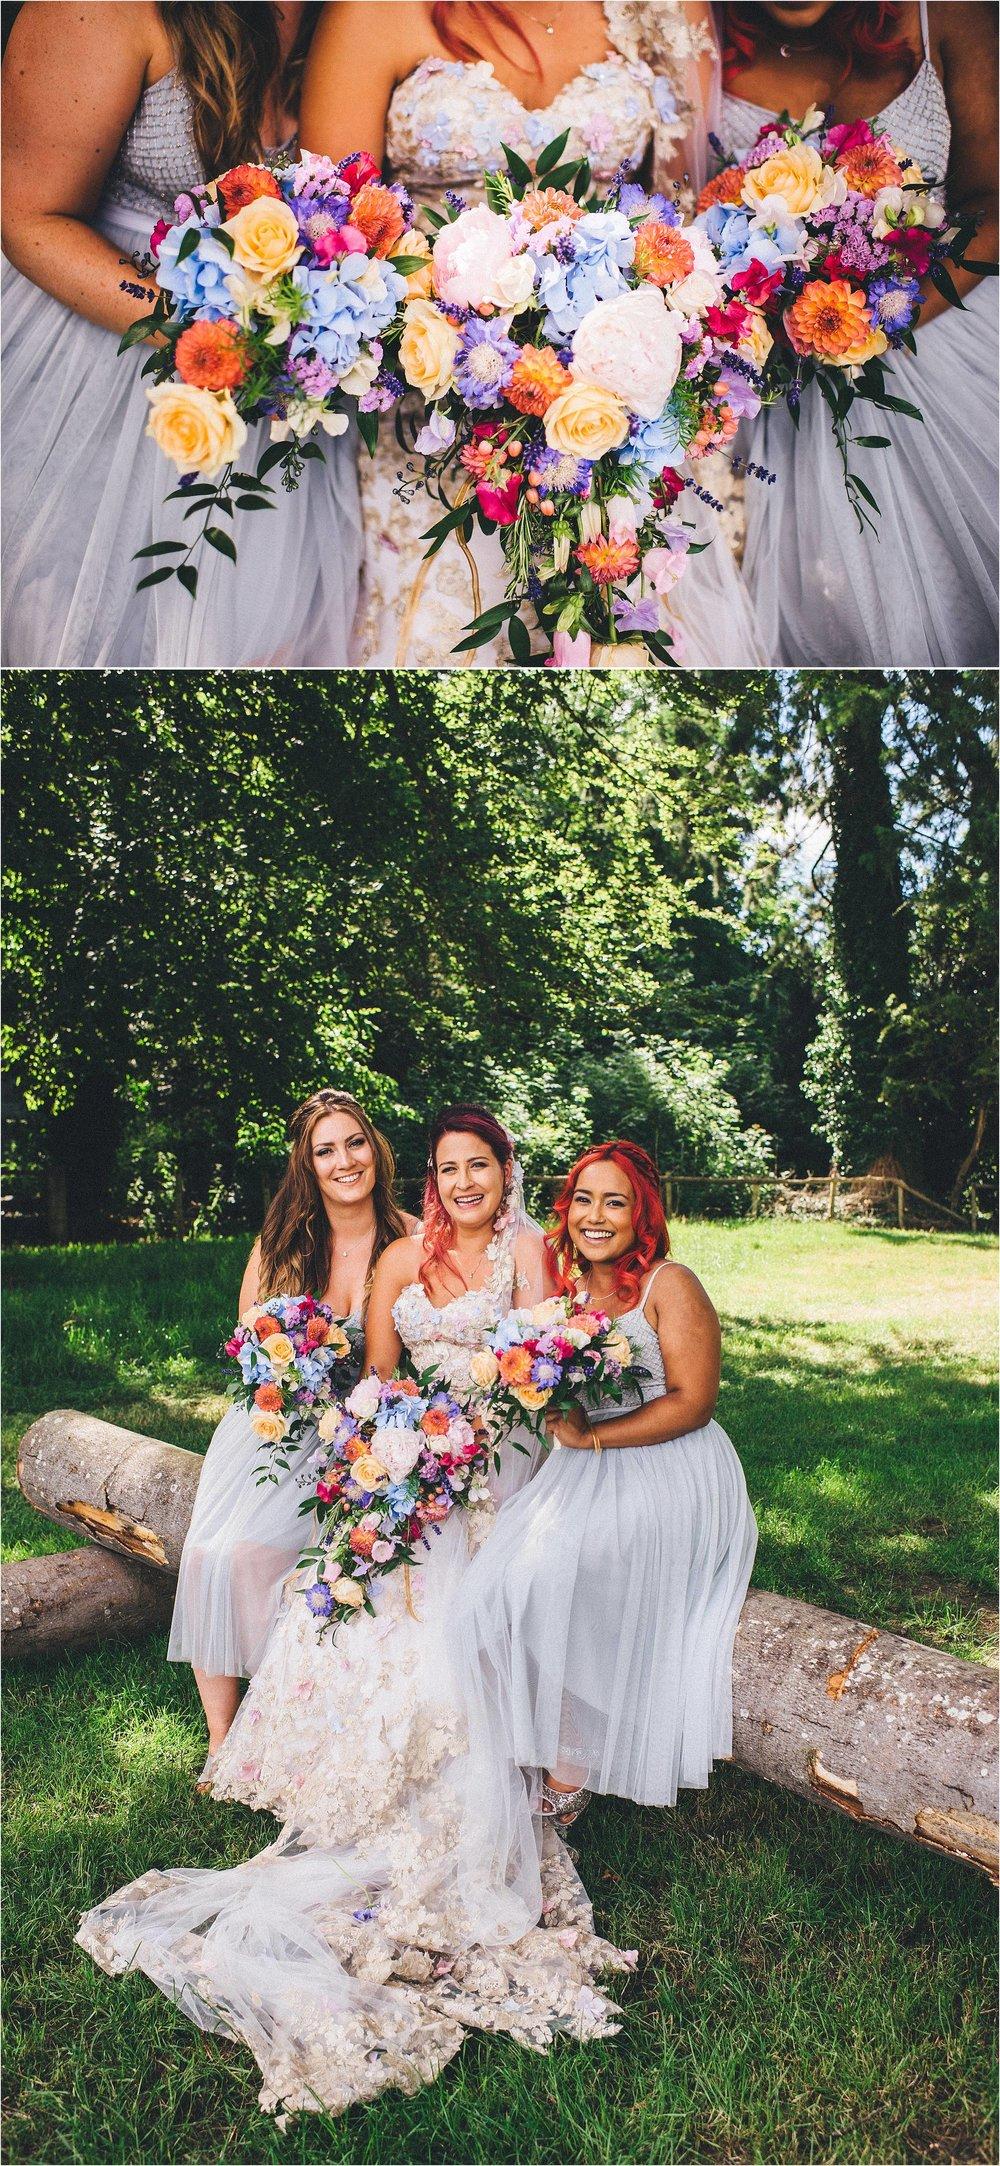 Milton Abbey Dorset Wedding Photographer_0122.jpg